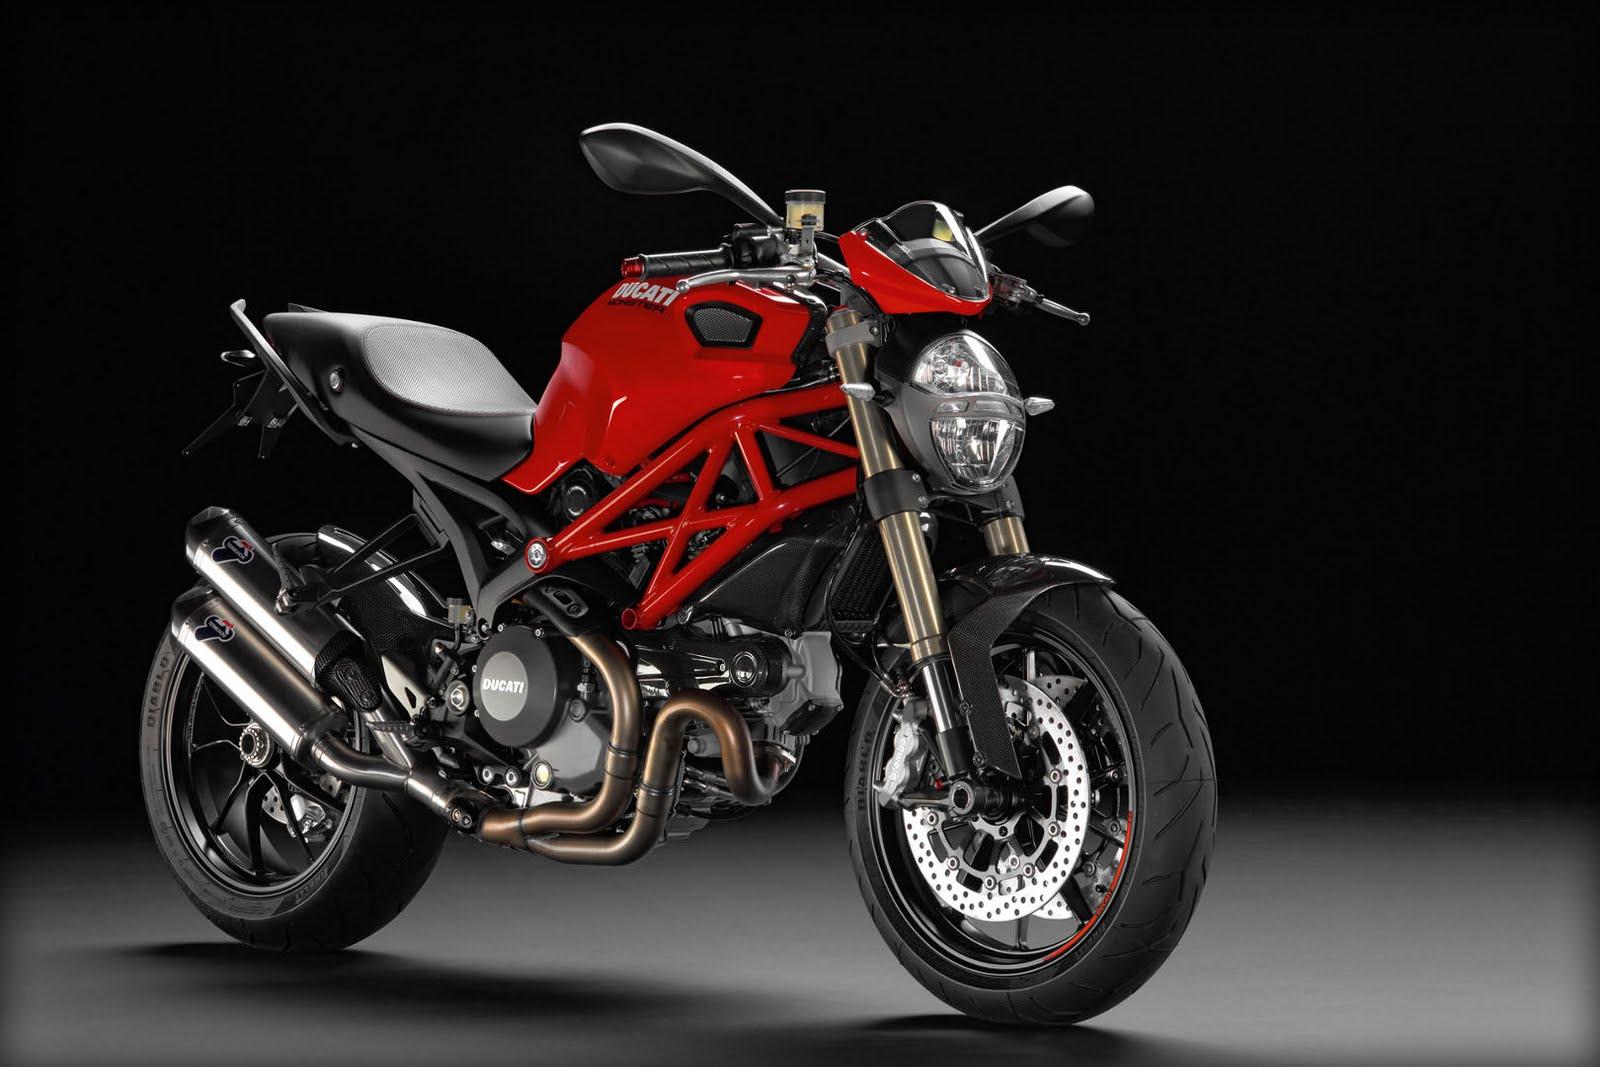 Ducati Monster Reliability